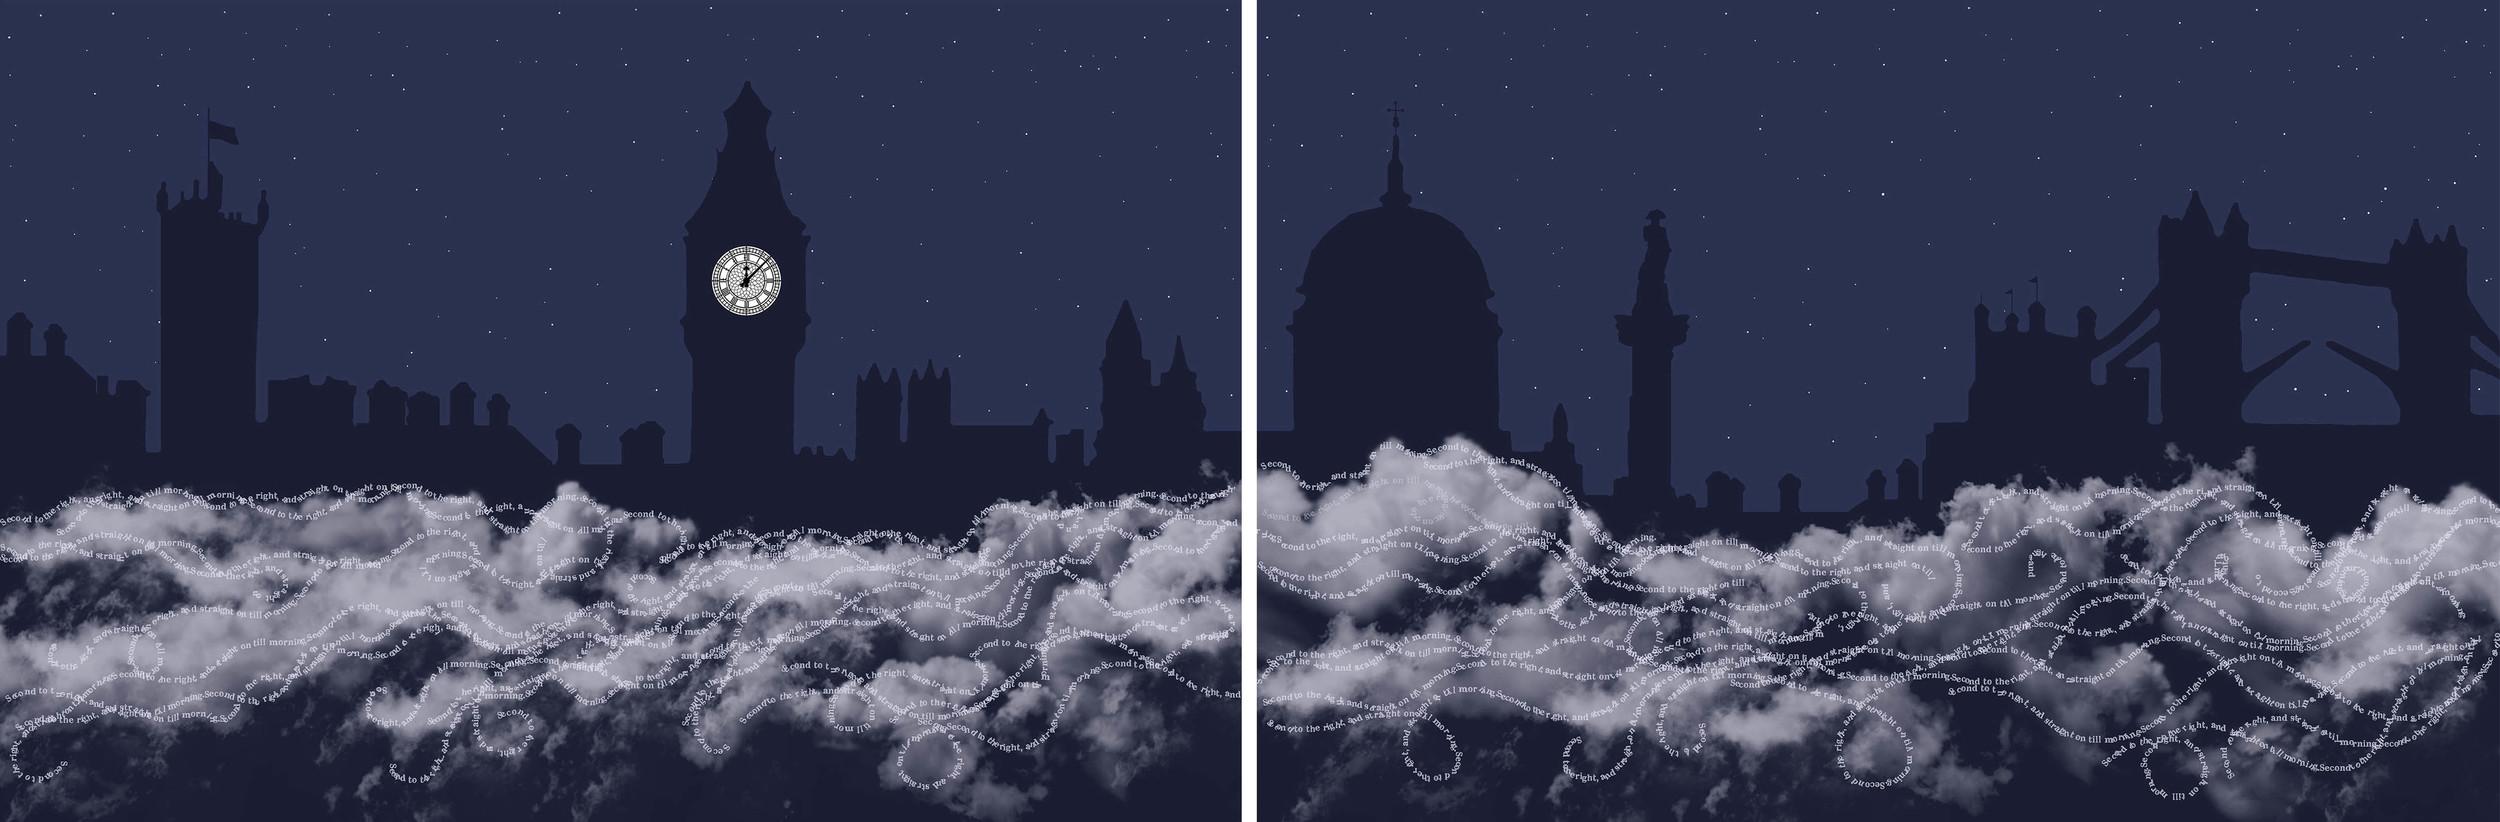 Peter Pan - combined skyline copy.jpg